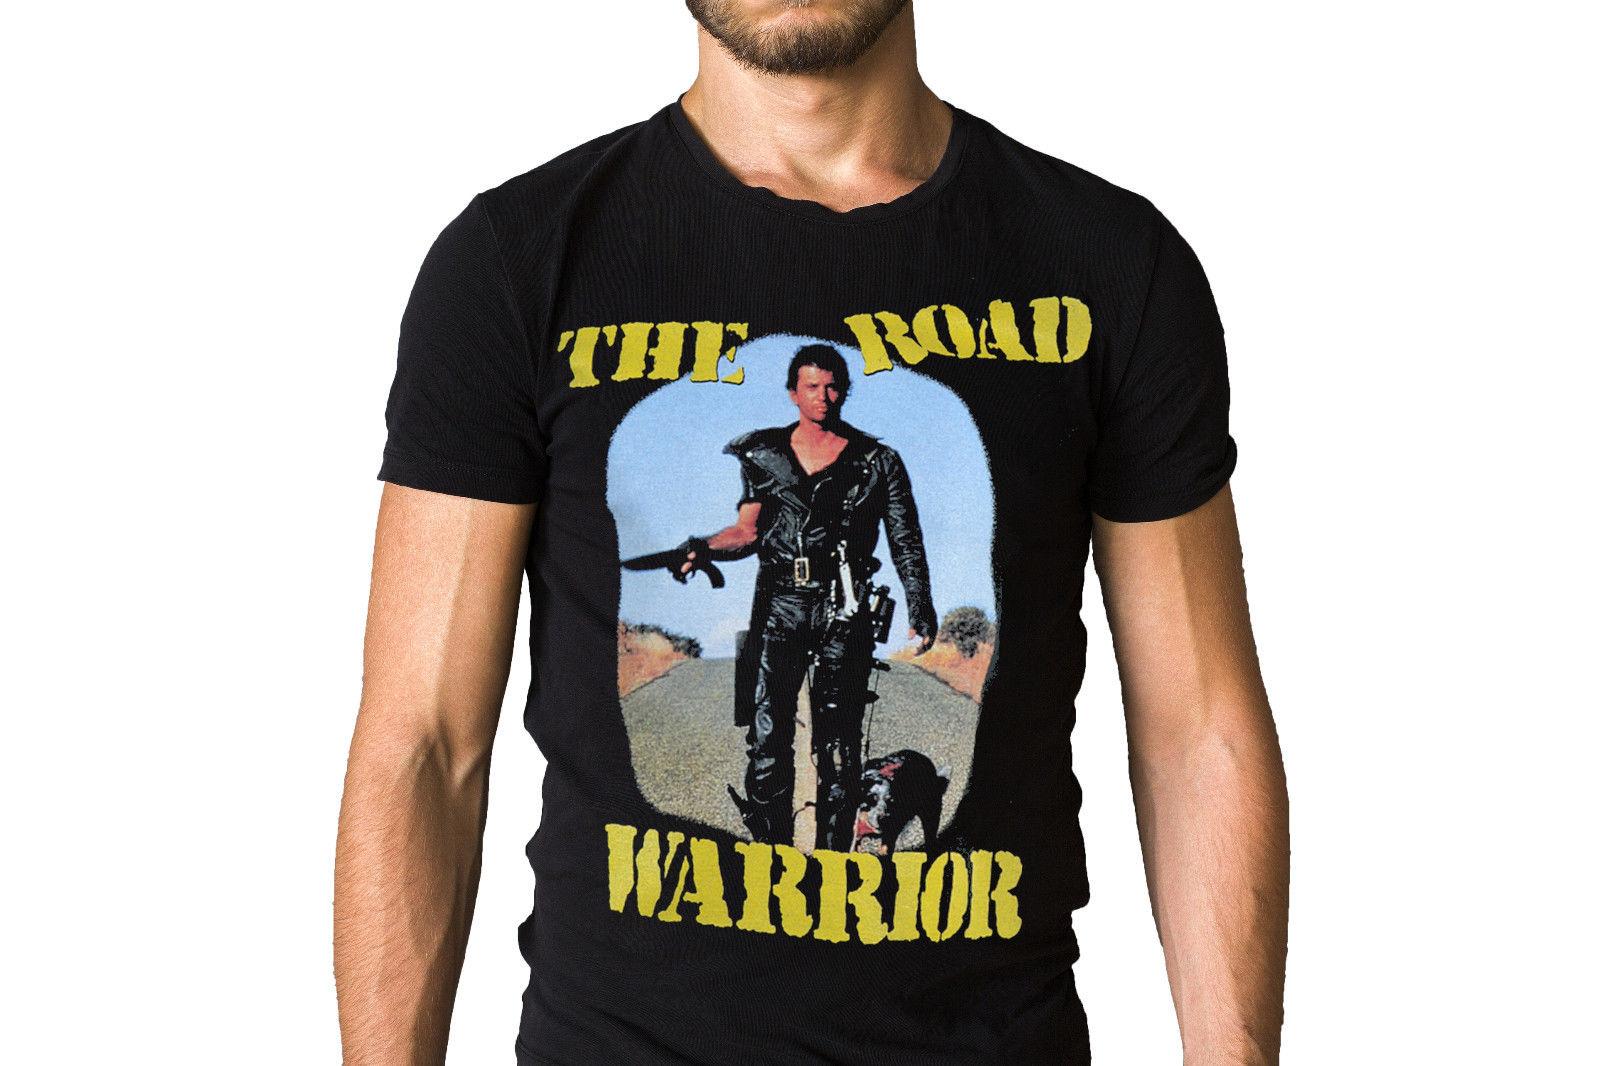 Mad Max 2 The Road Warrior T-Shirt Short Sleeves Cotton Free Shipping MenS T-Shirts Summer Style Fashion Swag Men T Shirts